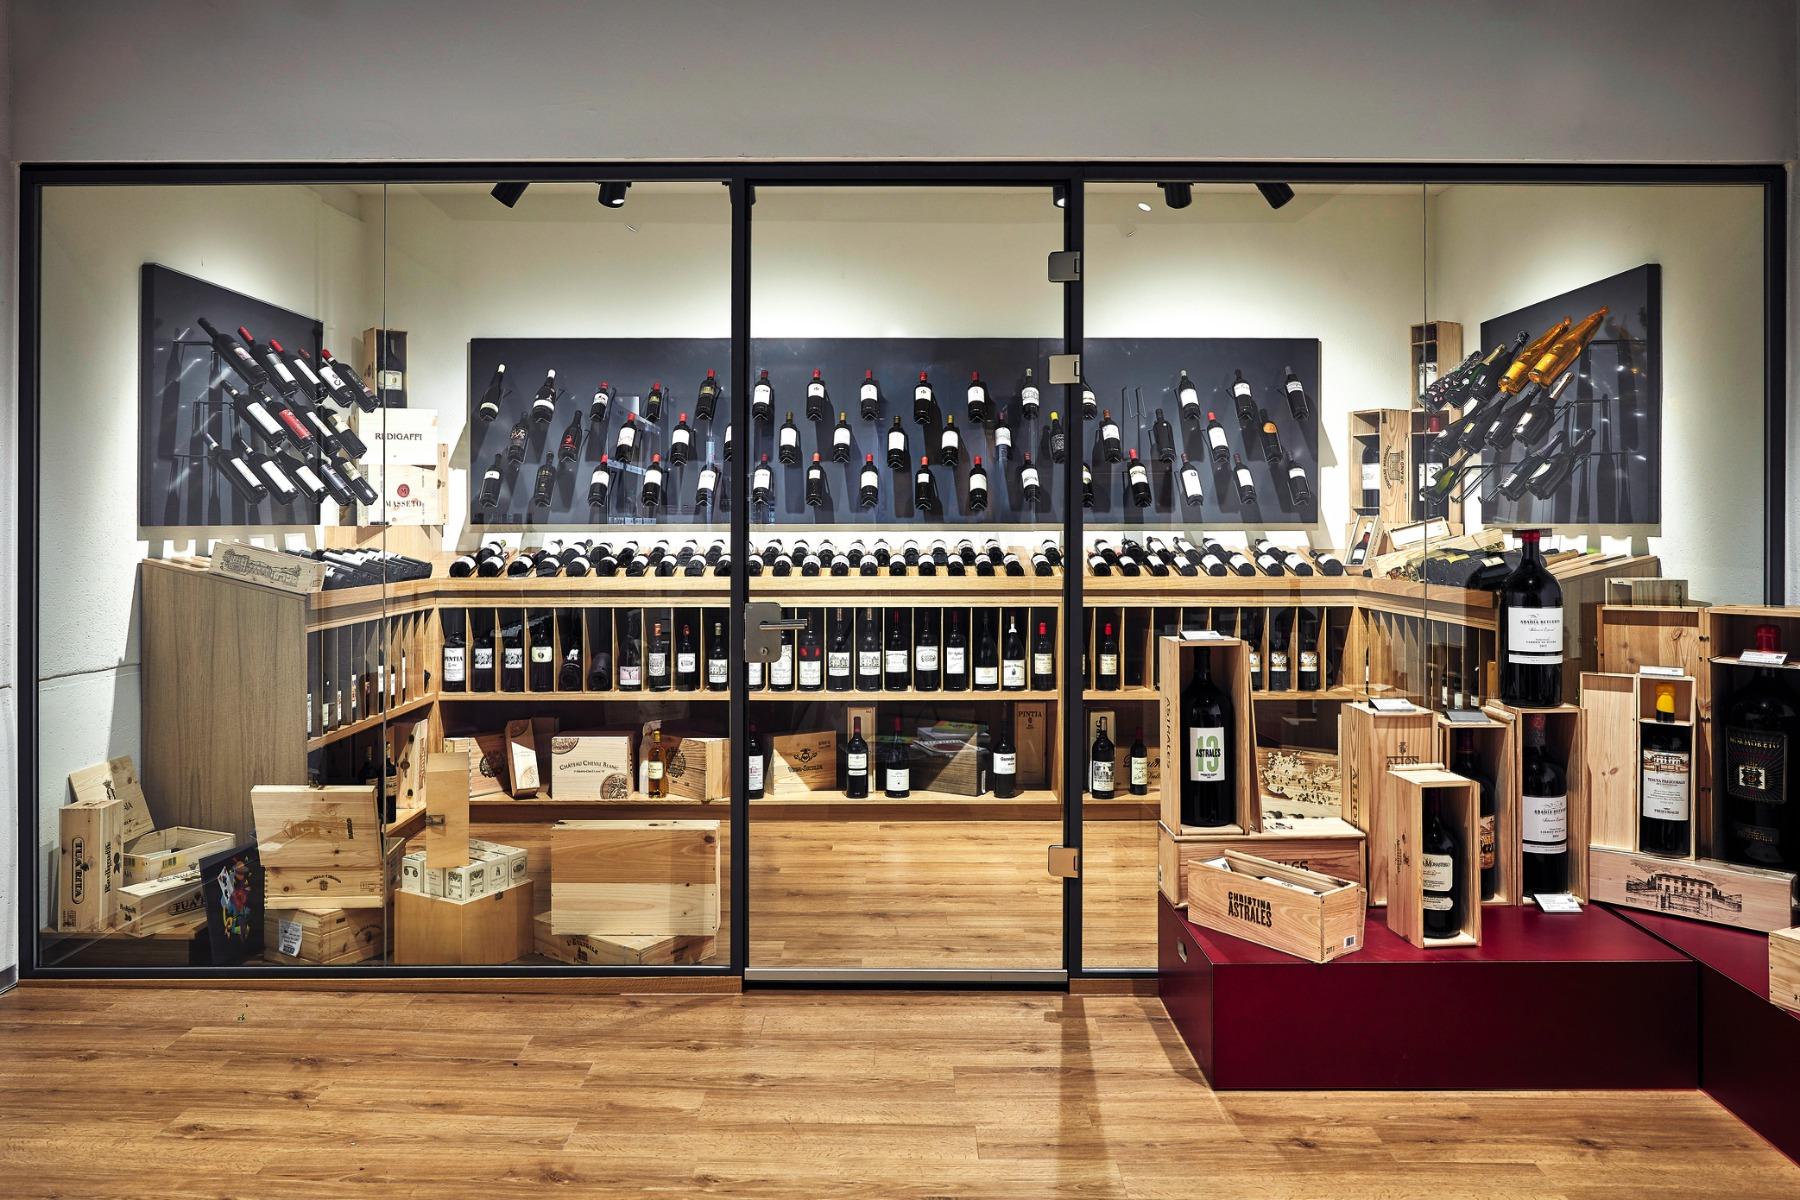 Raritätenraum bei Mövenpick Wein